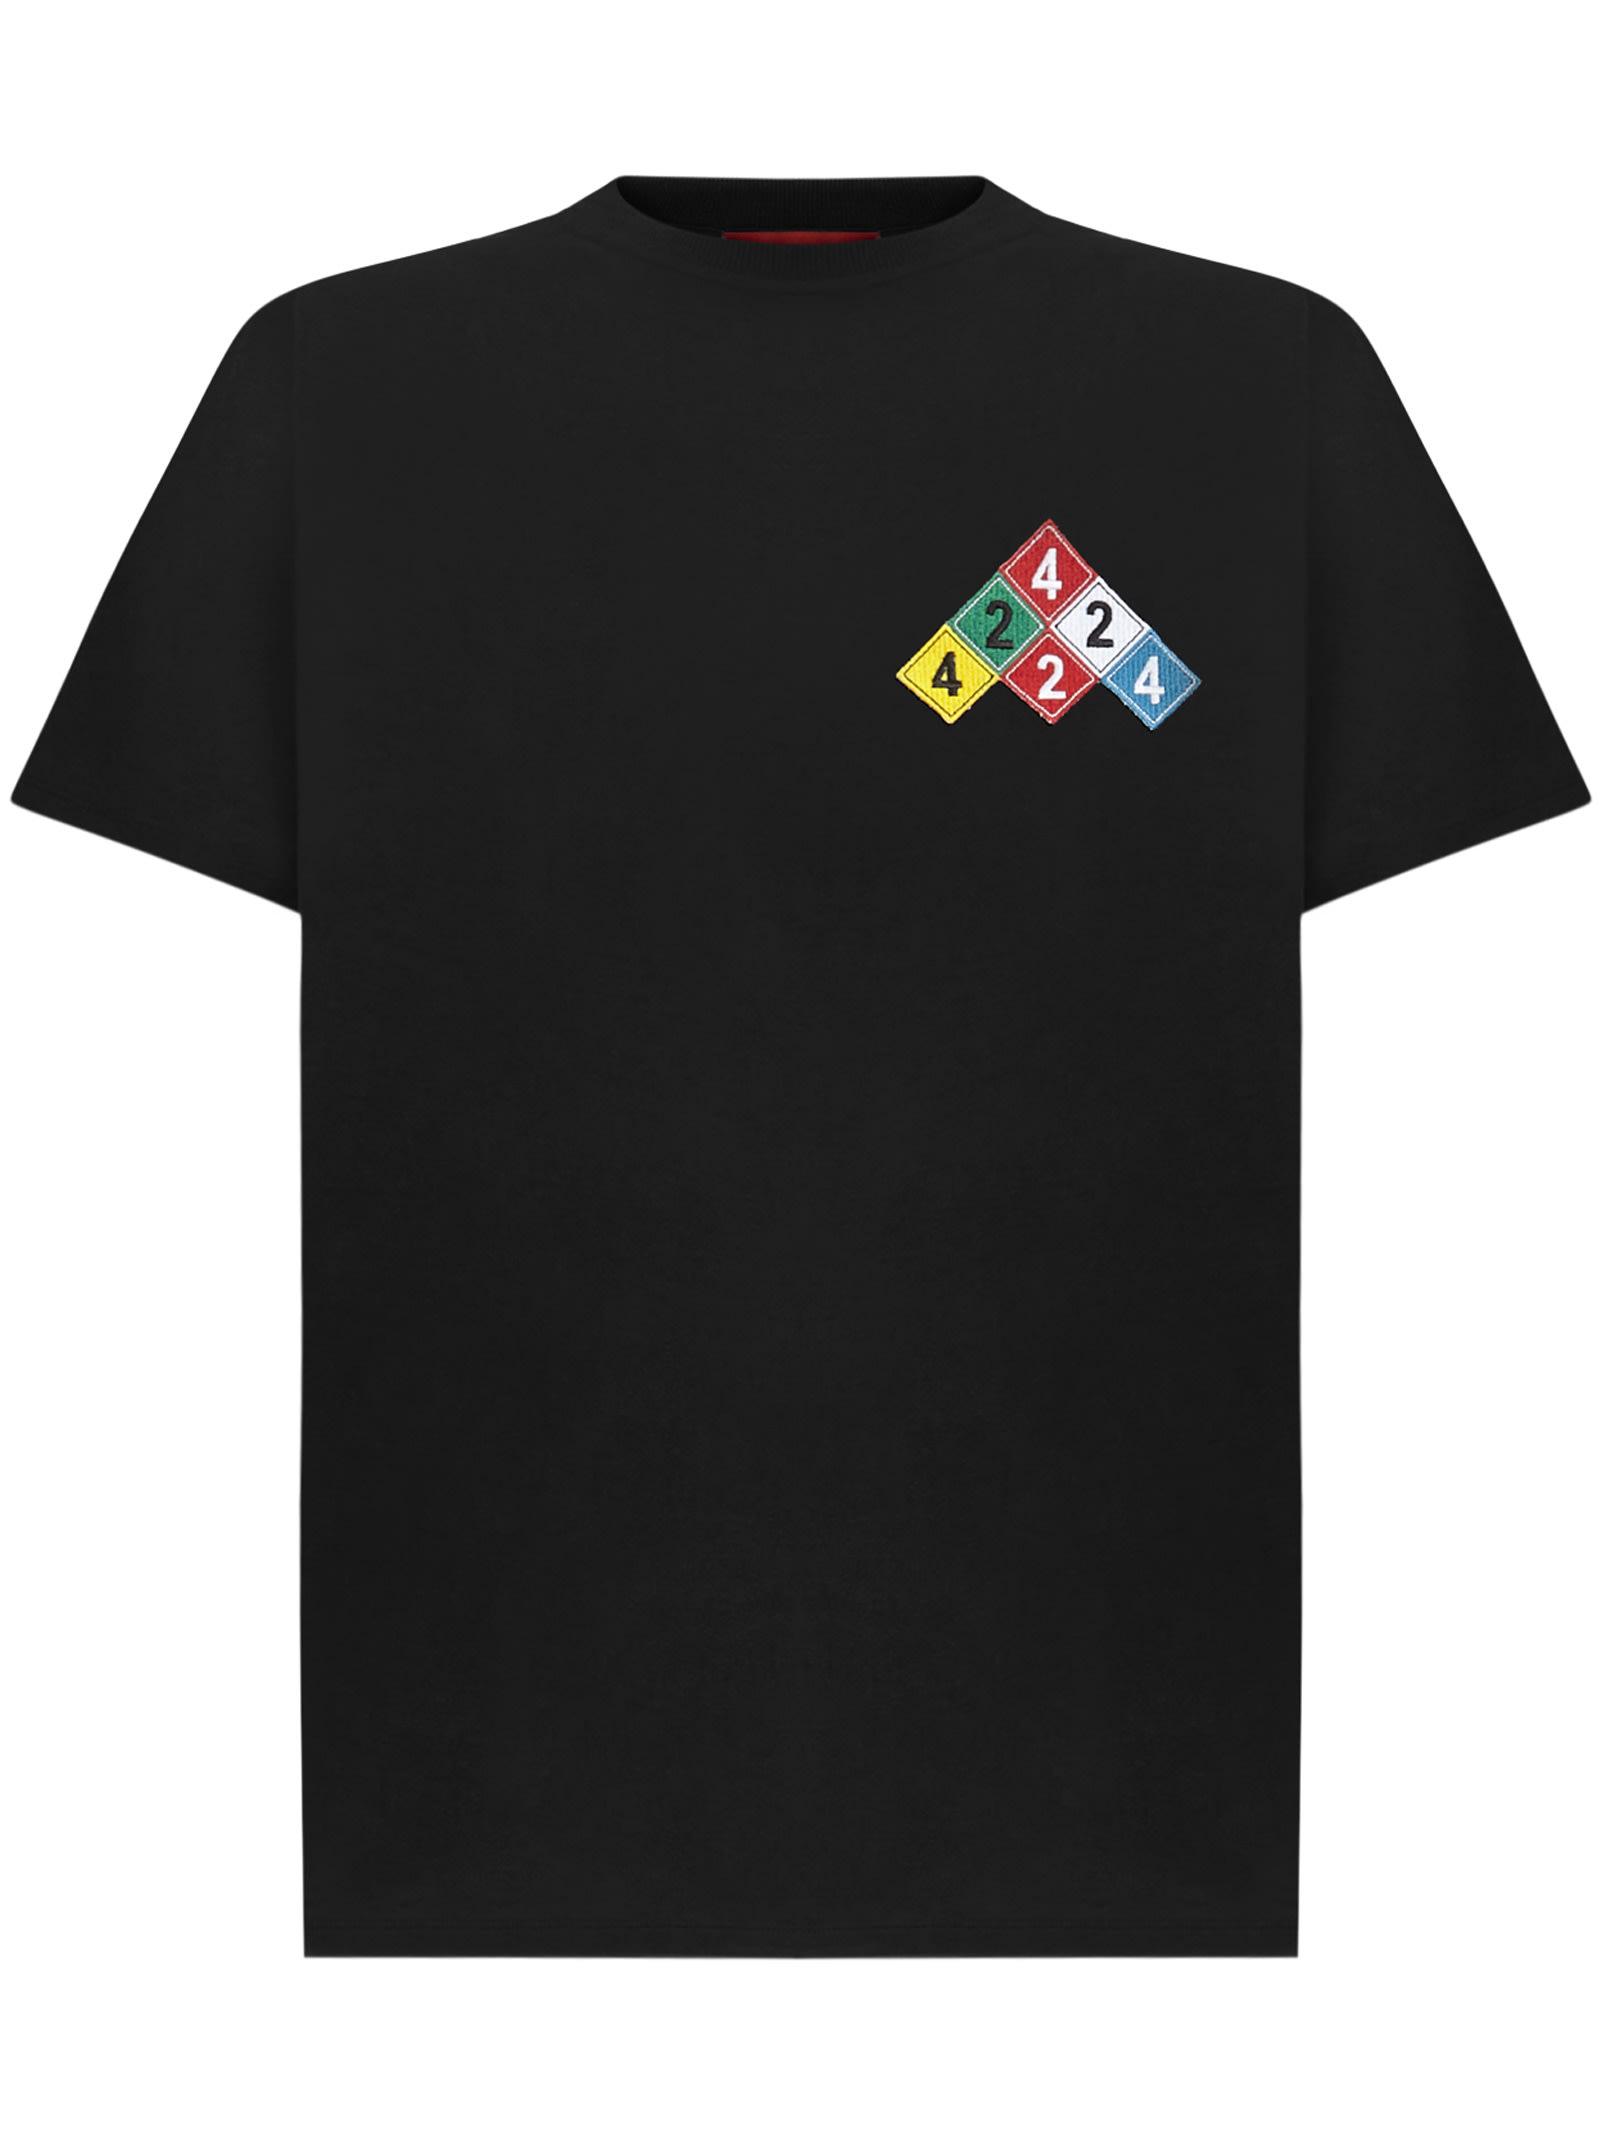 FourTwoFour on Fairfax T-shirt 424